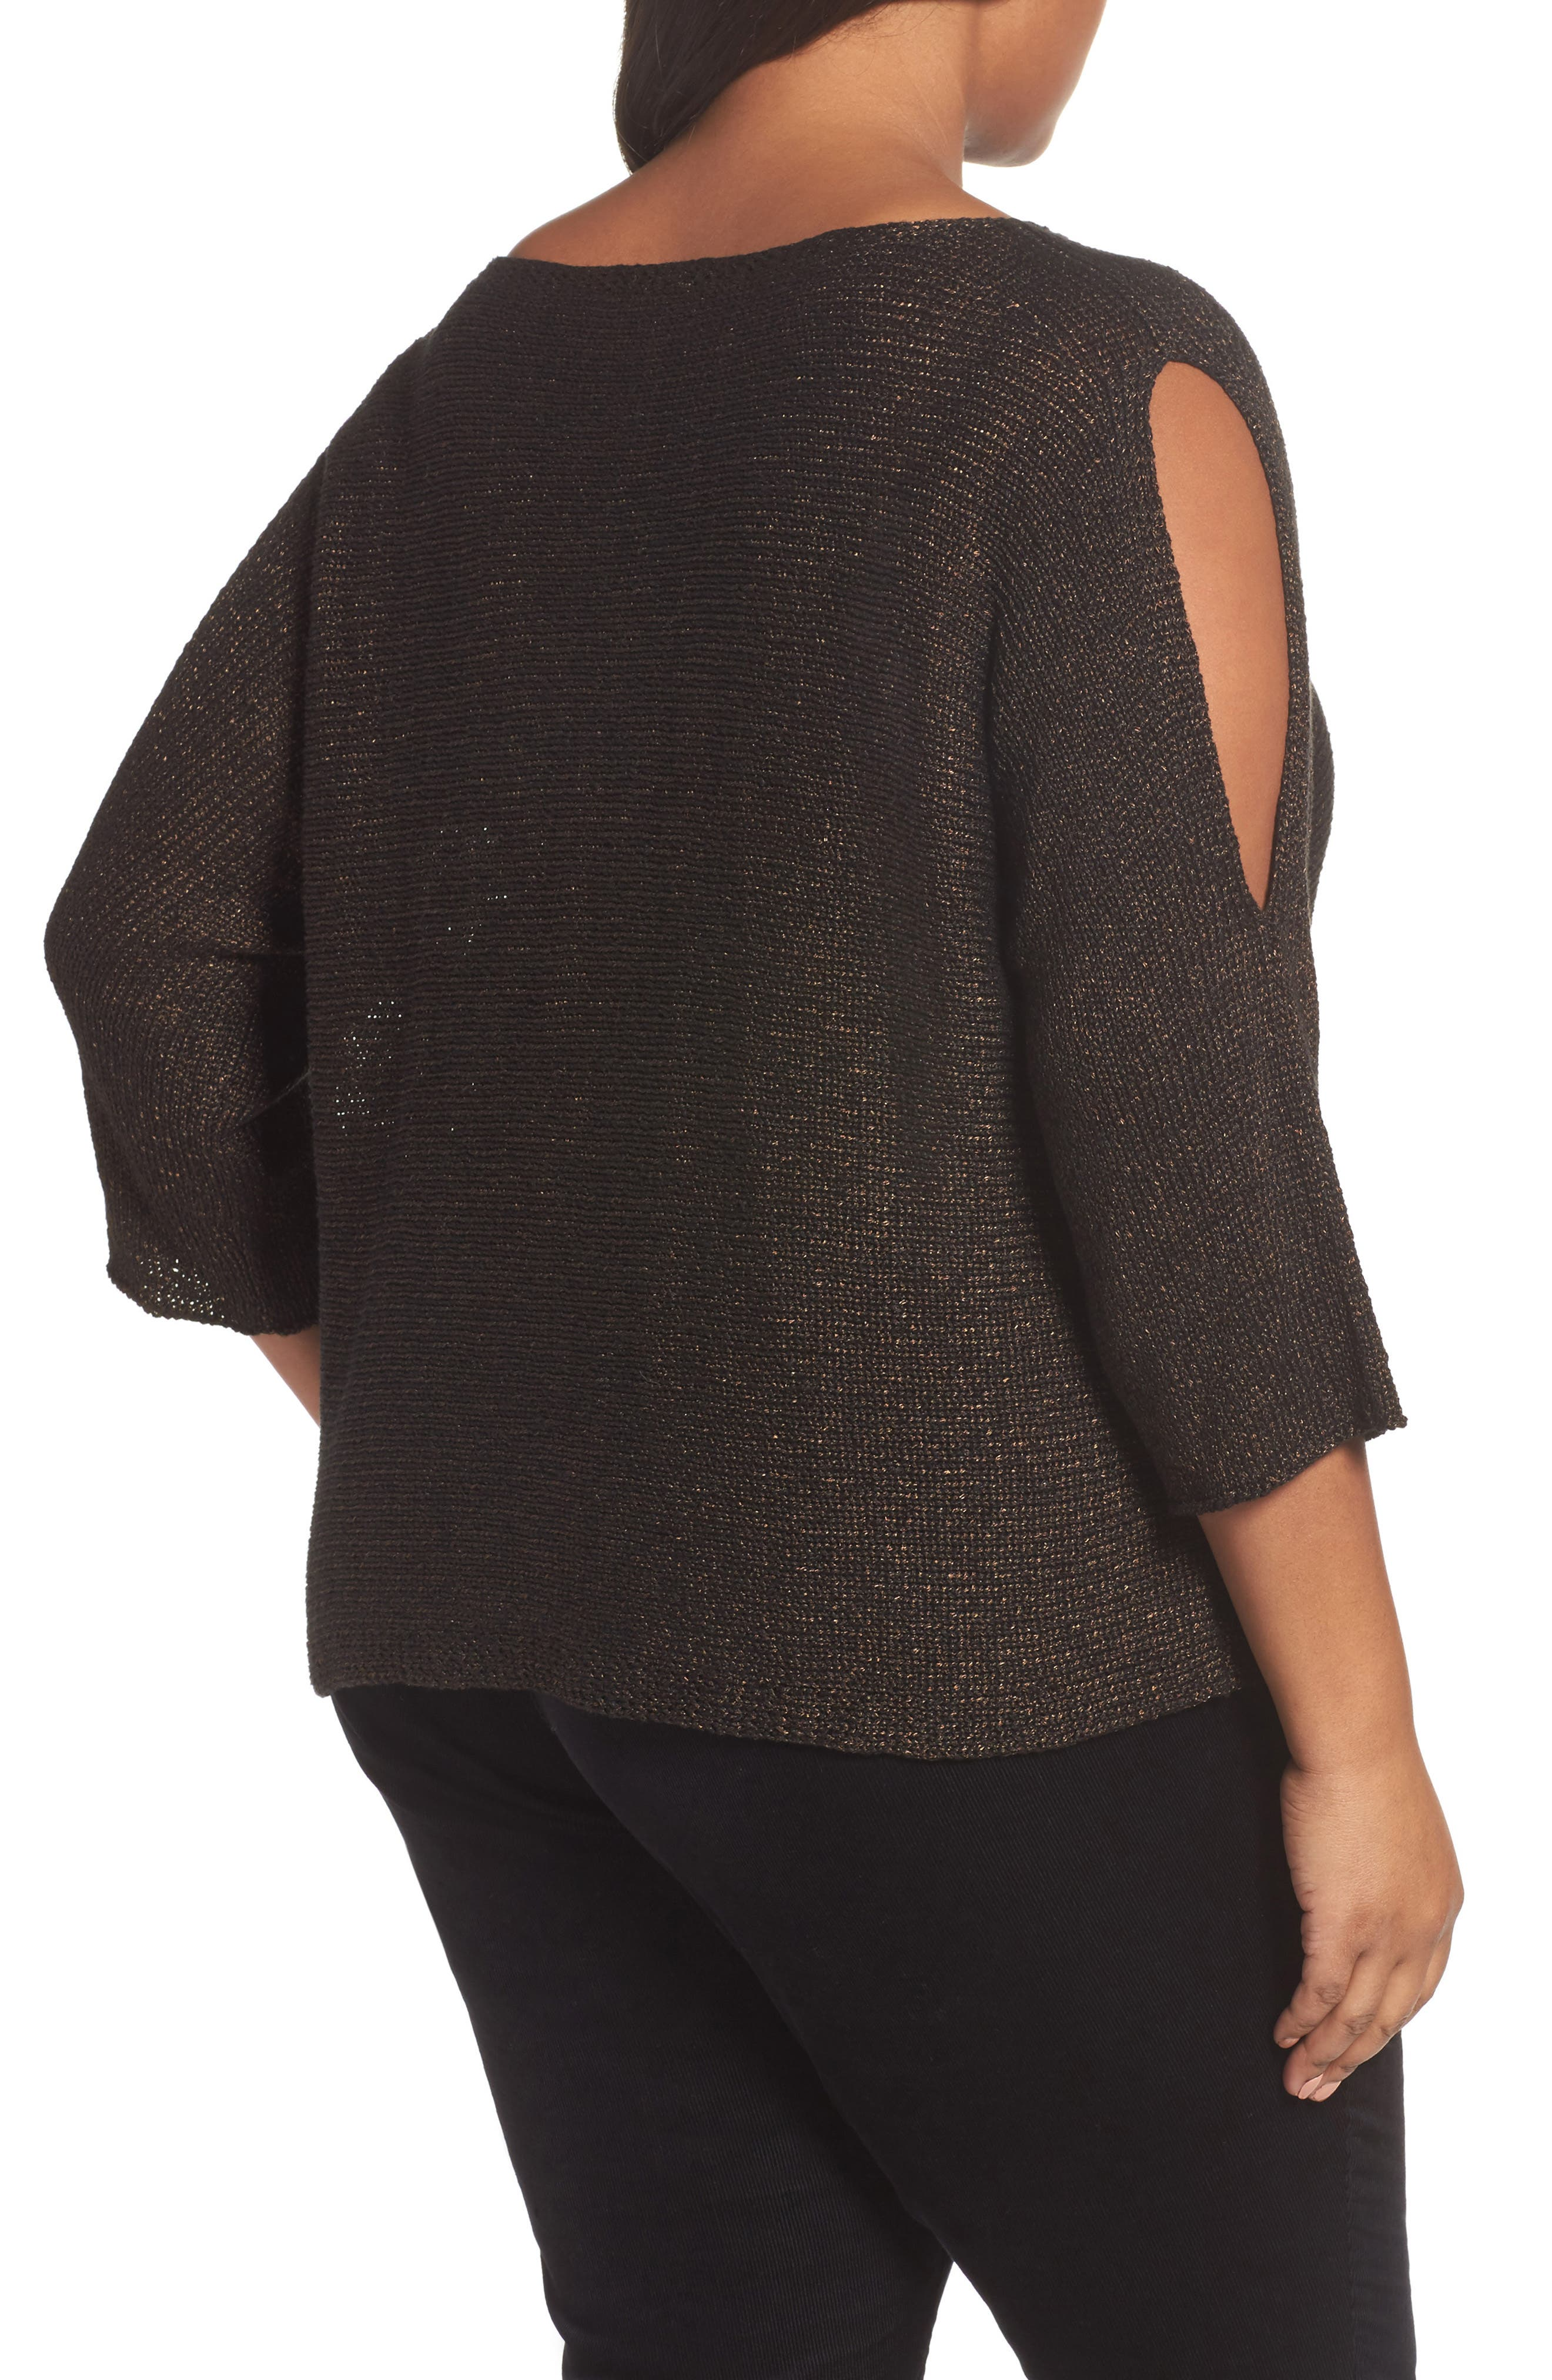 Alternate Image 2  - Eileen Fisher Metallic Organic Linen Blend Sweater (Plus Size)